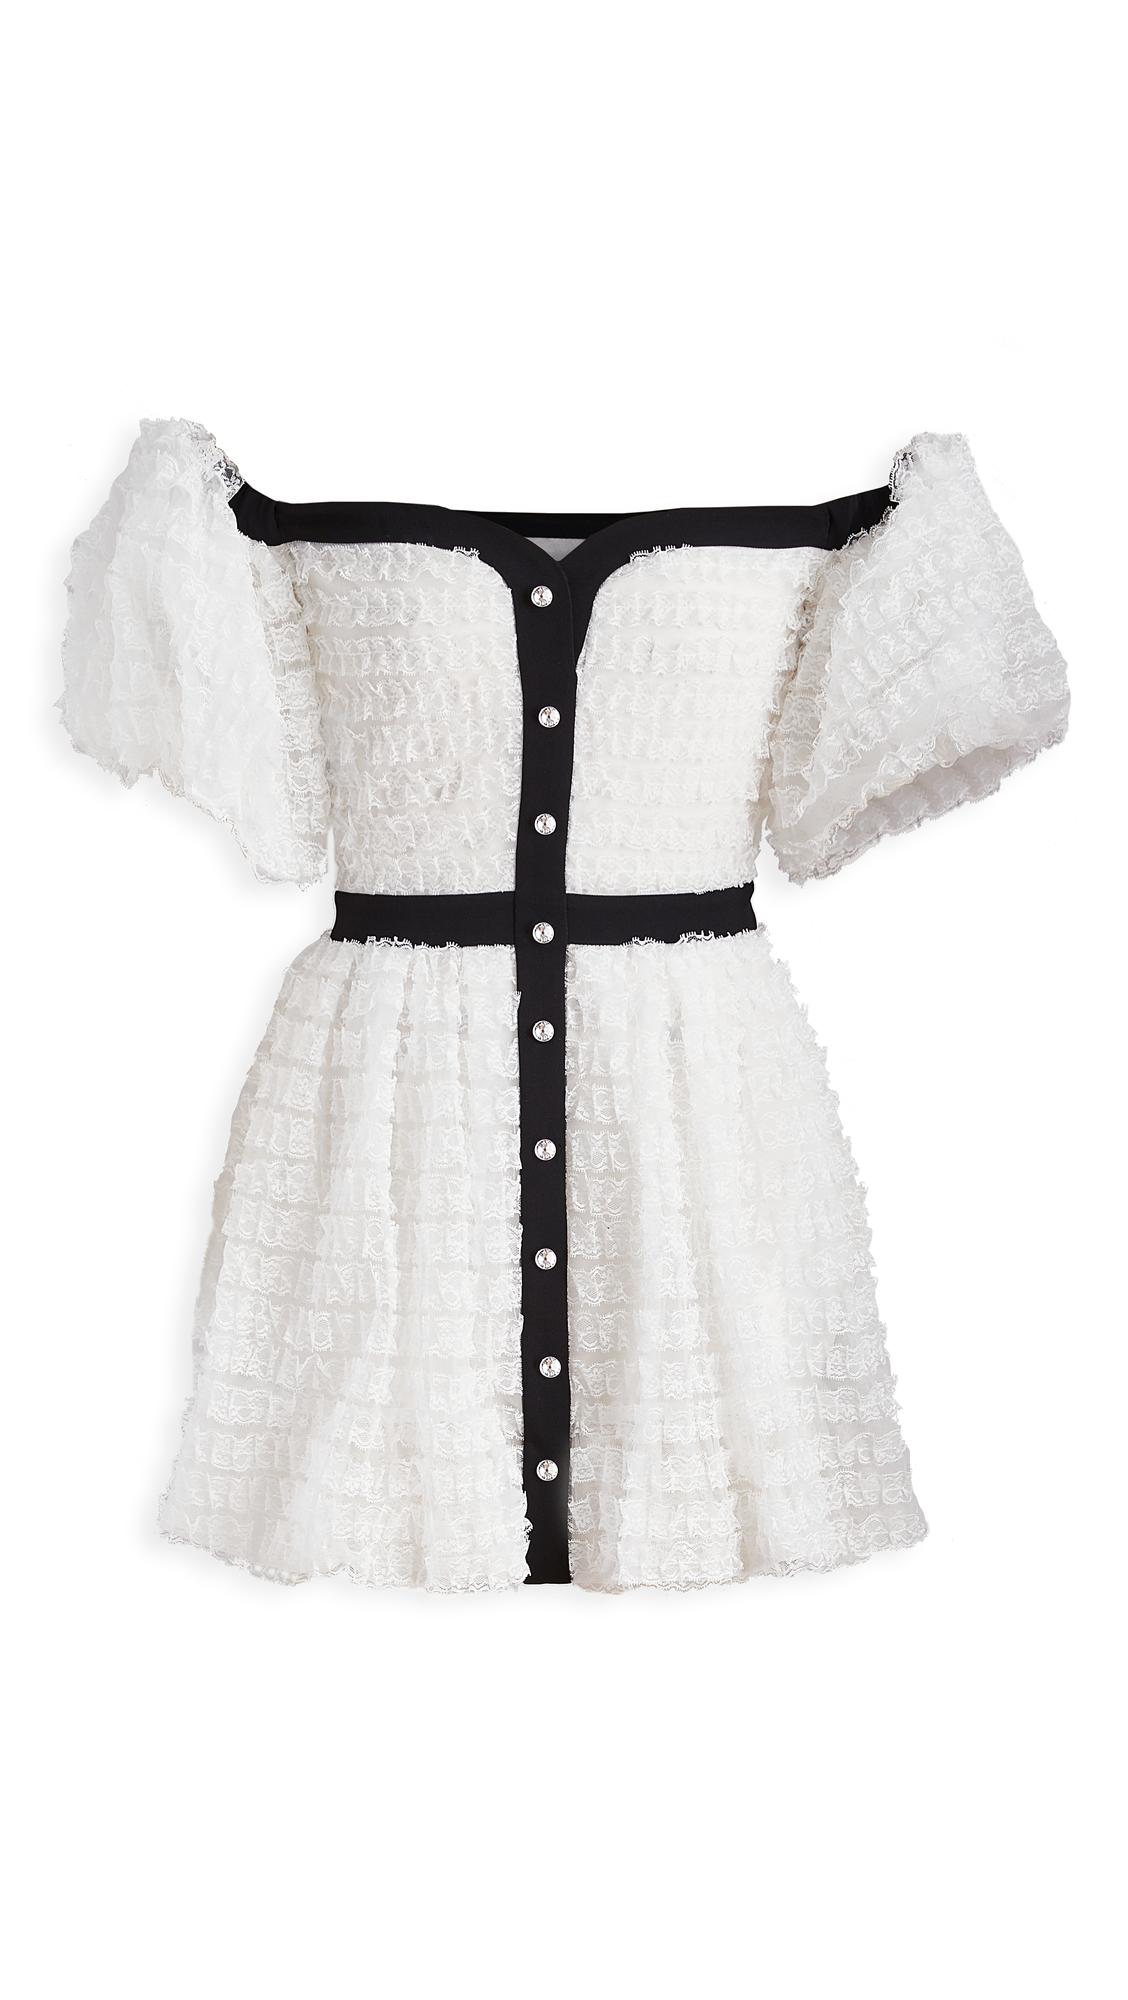 Photo of Philosophy di Lorenzo Serafini Off Shoulder Mini Dress - shop Philosophy di Lorenzo Serafini Clothing, Dresses online